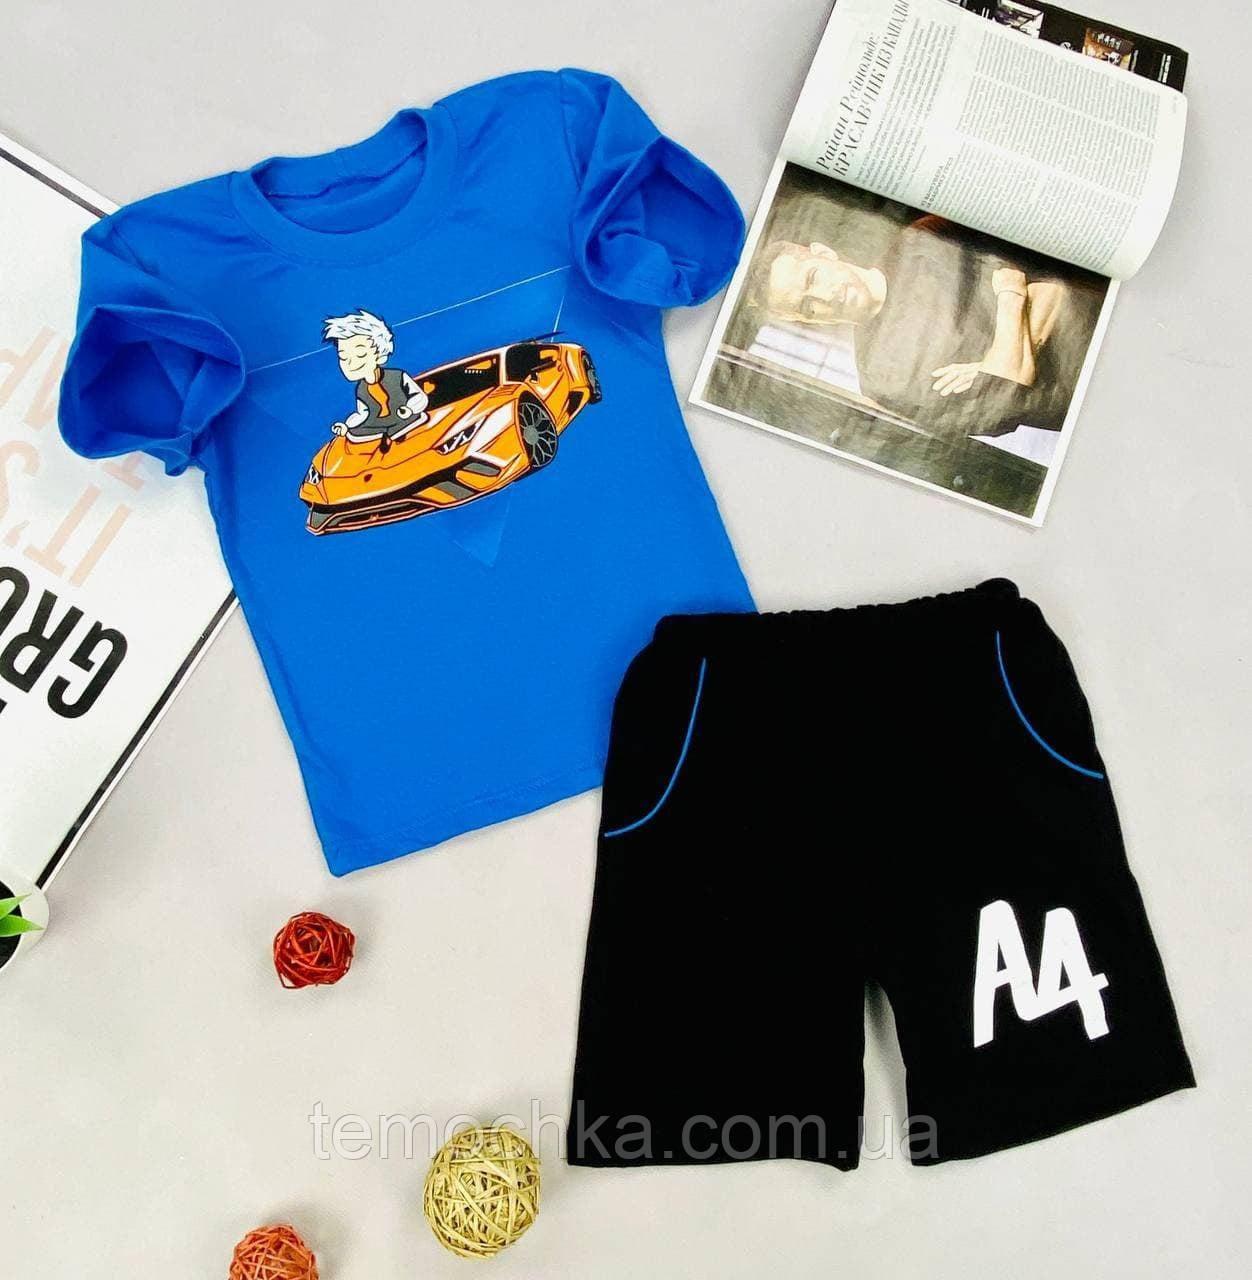 Комплект футболка і шорти для хлопчика А4 Бумага